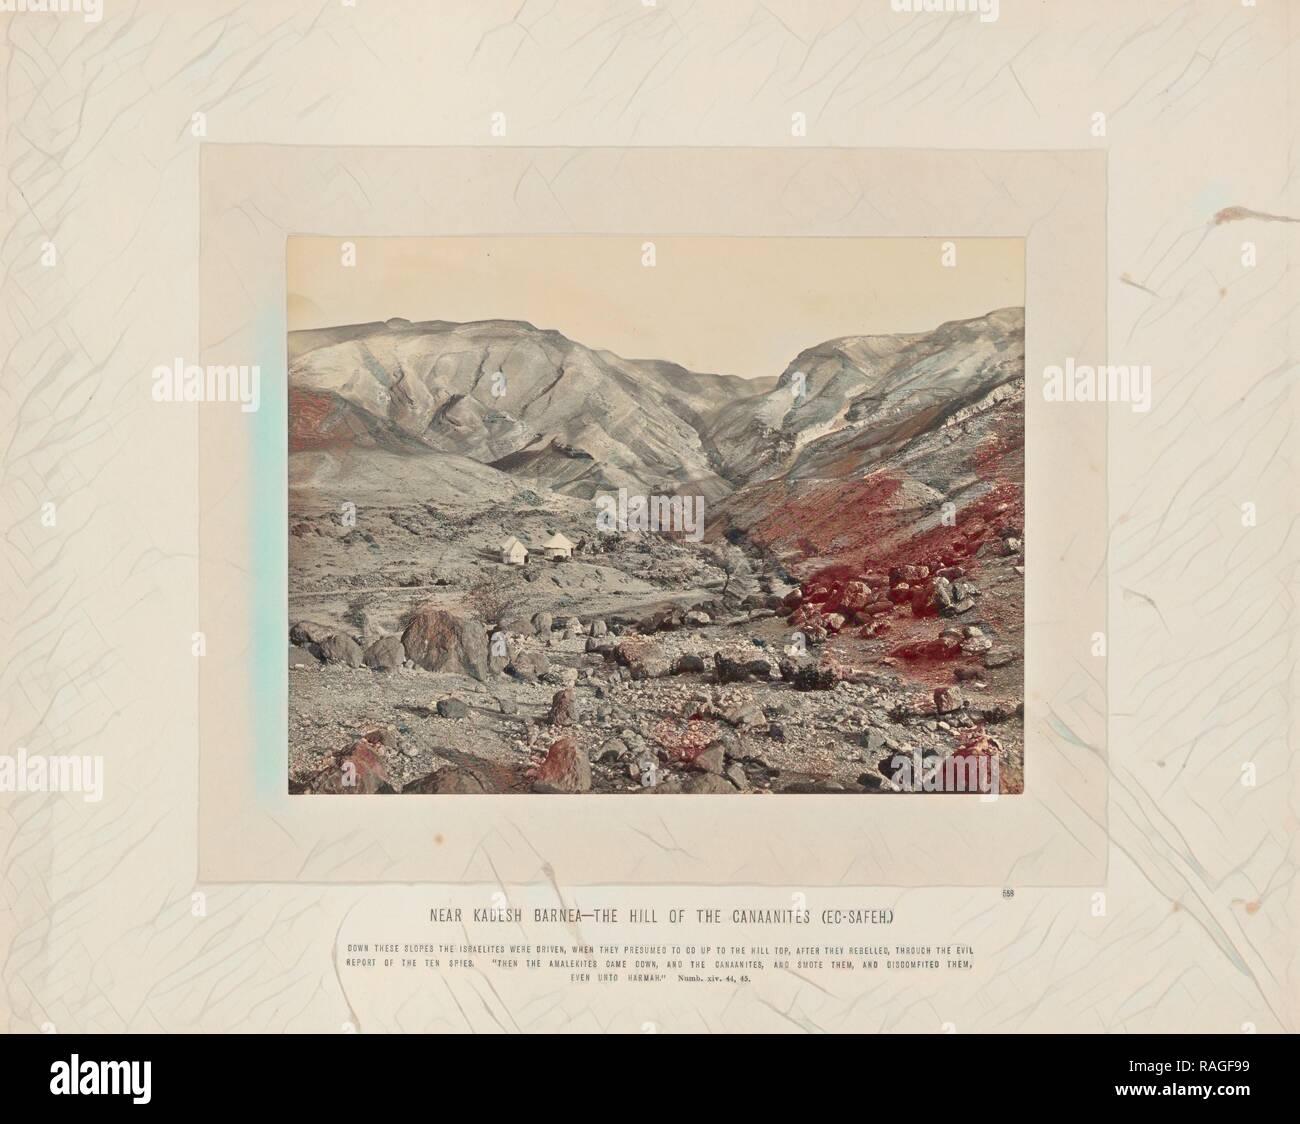 Near Kadesh Barnea - the Hill of the Canaanites (Ec-Safeh), Francis Frith (English, 1822 - 1898), Sinai Peninsula reimagined - Stock Image